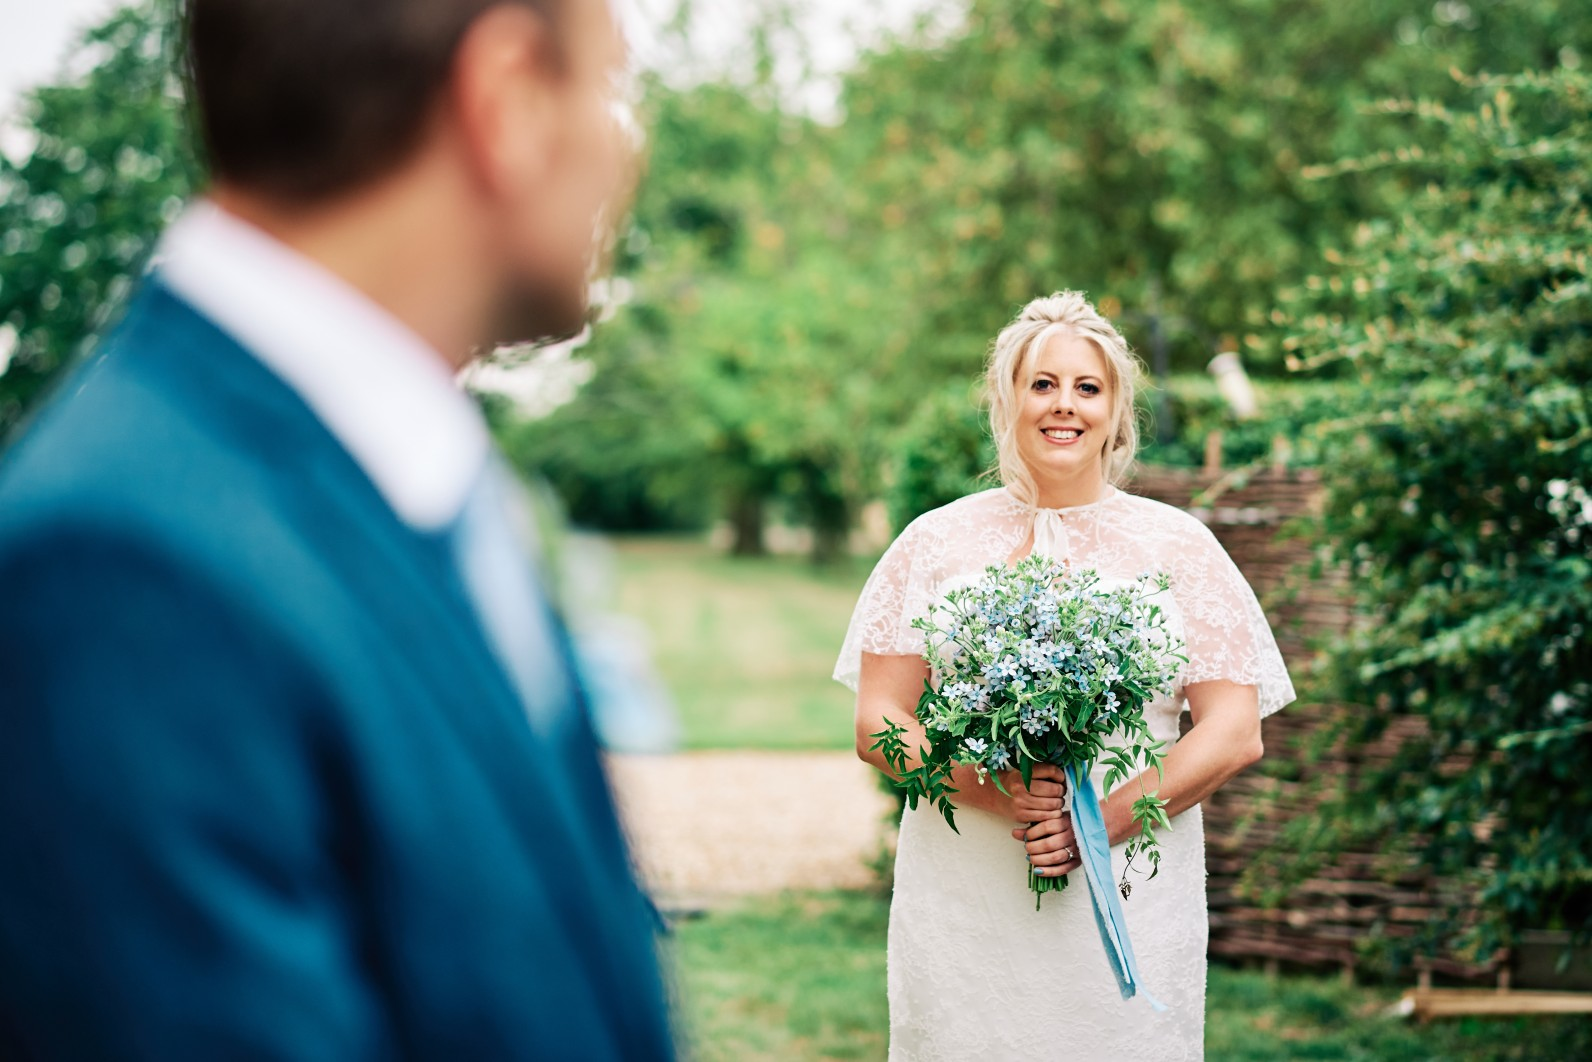 nhs wedding - paramedic wedding - blue and gold wedding - outdoor wedding - micro wedding - surprise wedding - elegant wedding dress and bridal cape